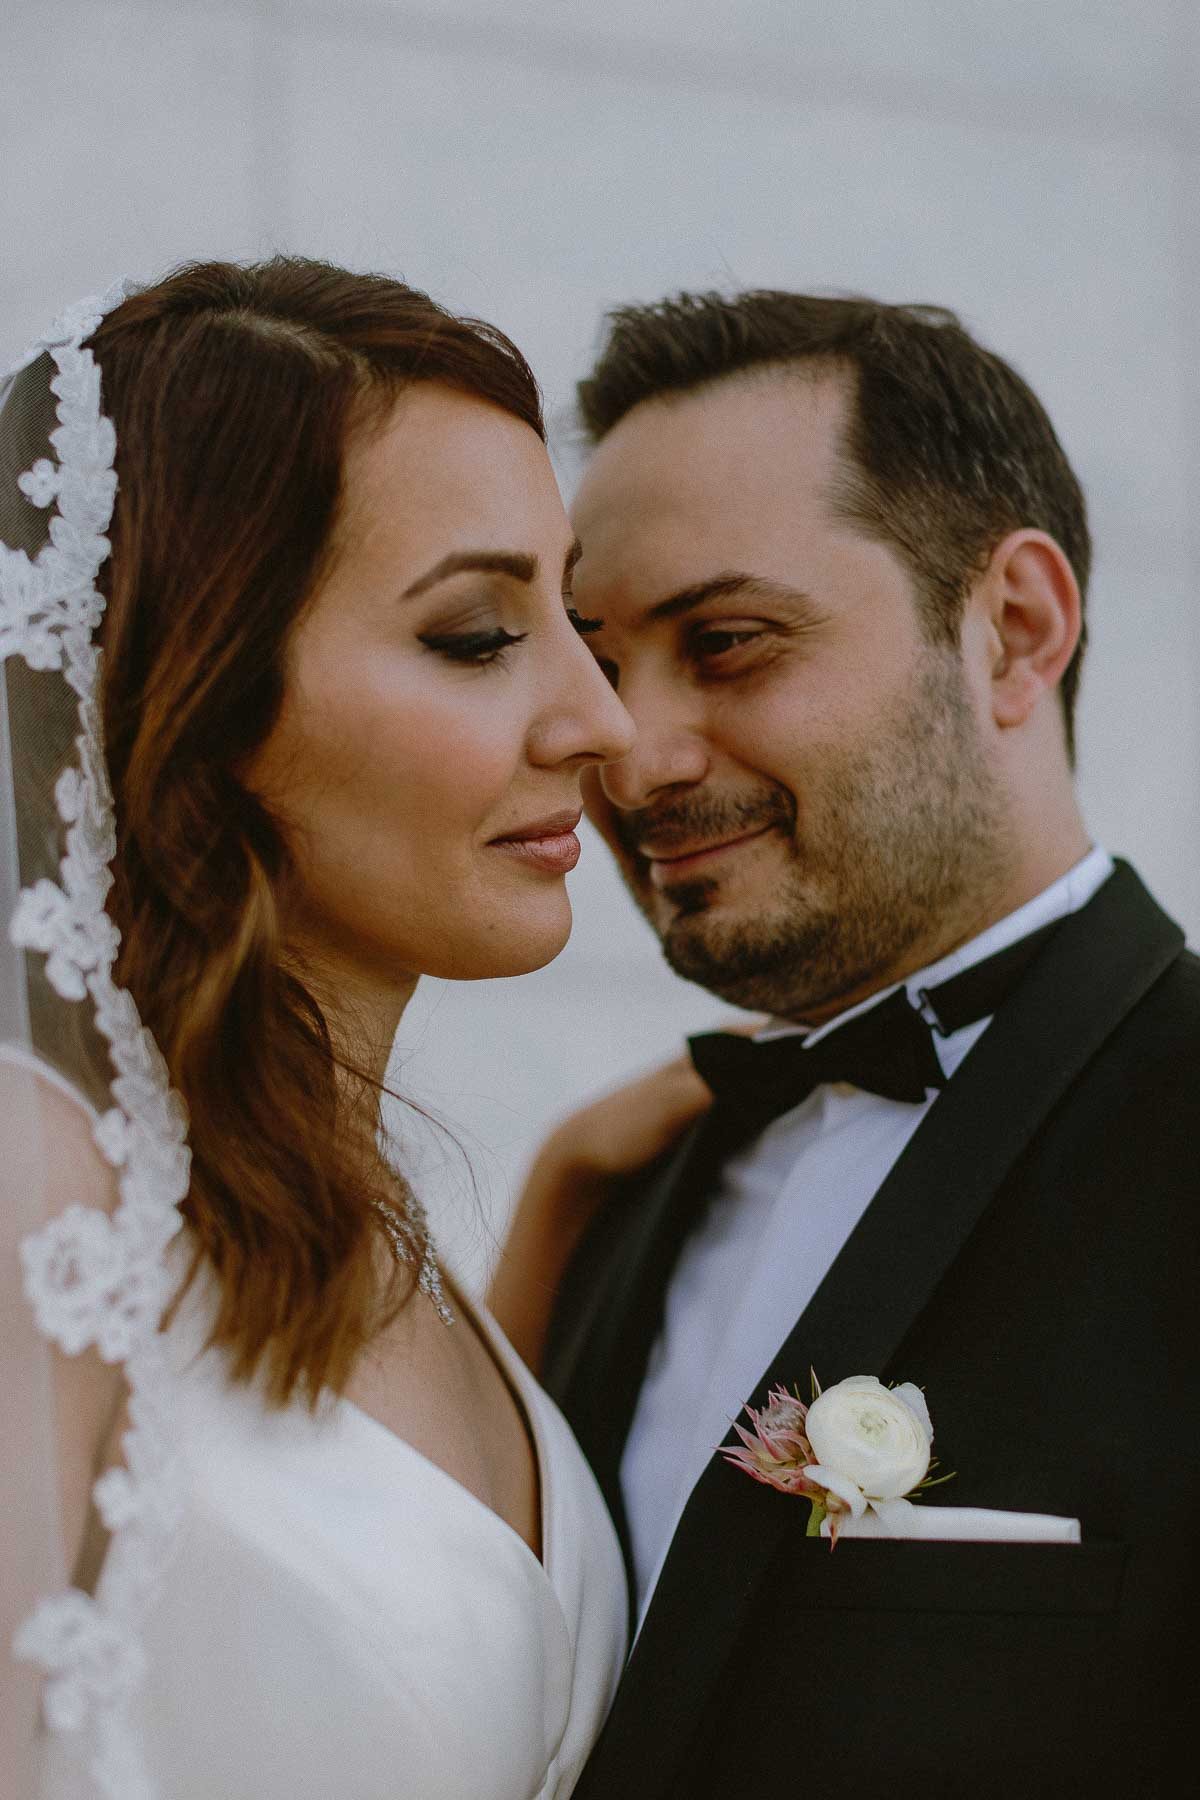 aga-khan-museum-wedding 0022.jpg